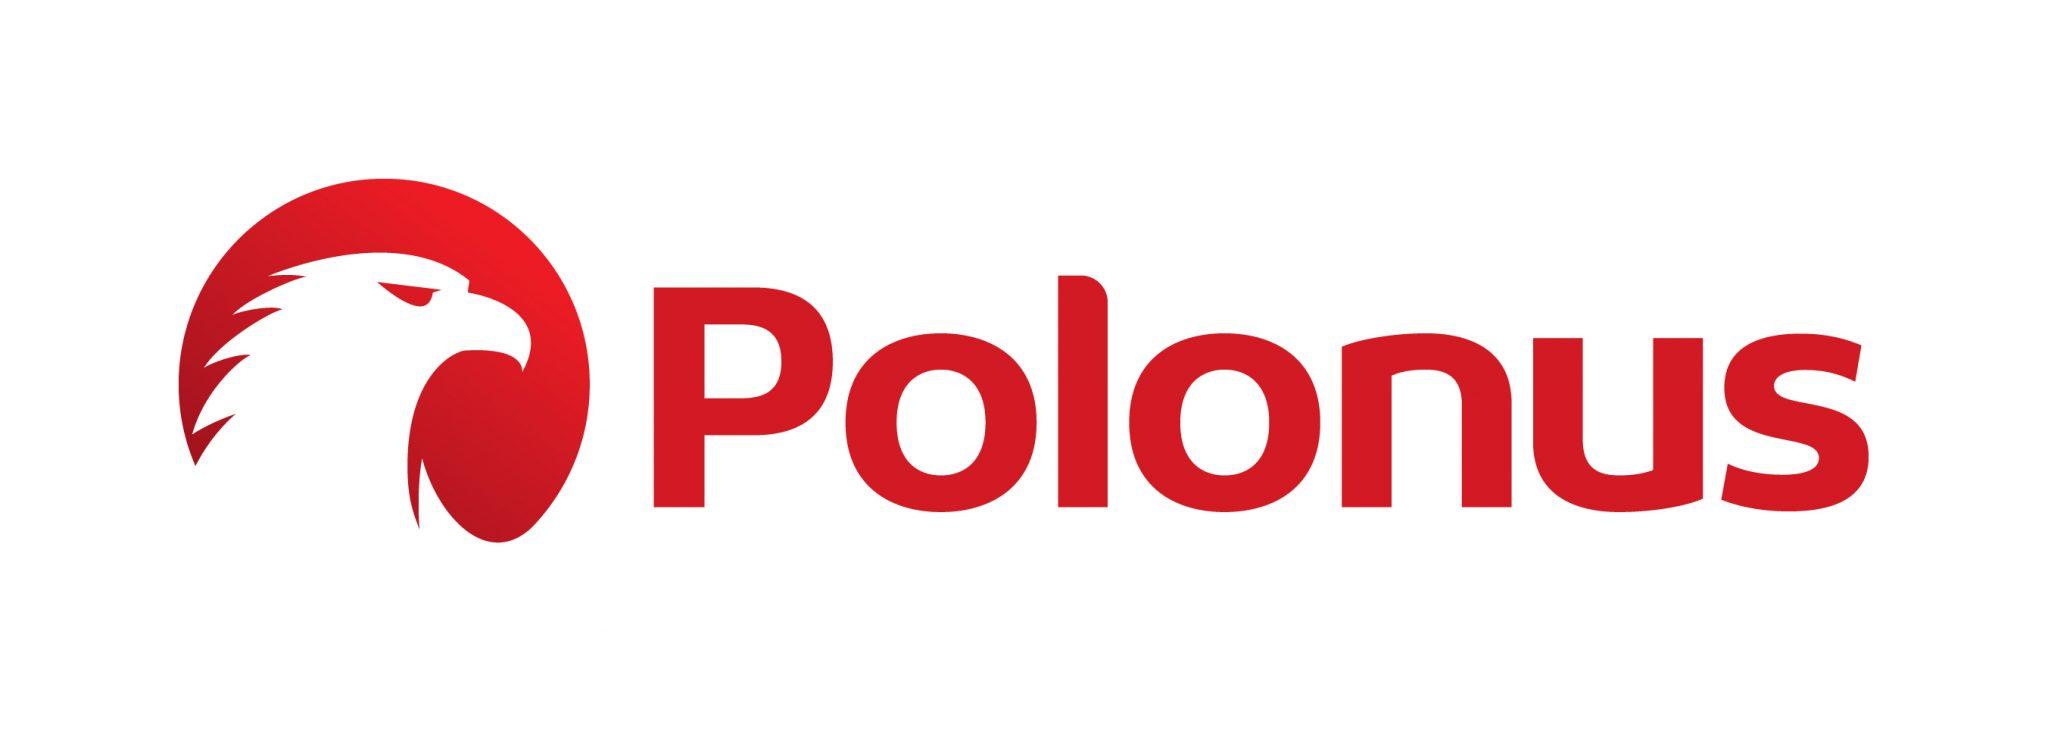 polonus logo